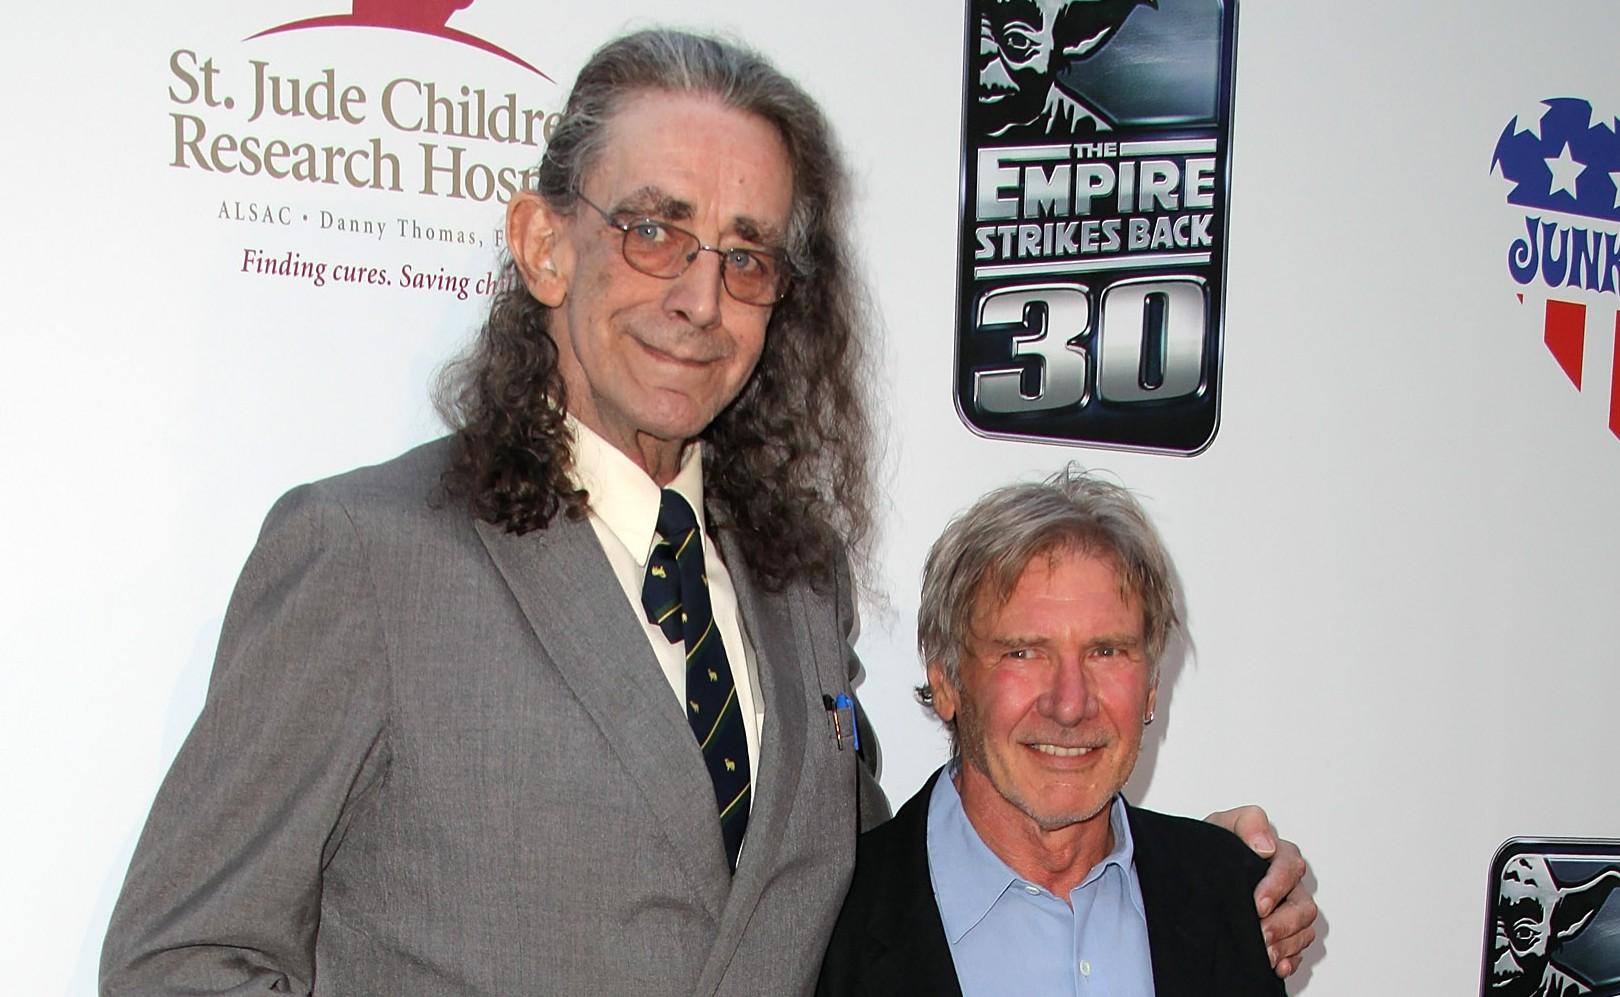 Original Chewbacca actor Peter Mayhew wants role in Star Wars Episode 7